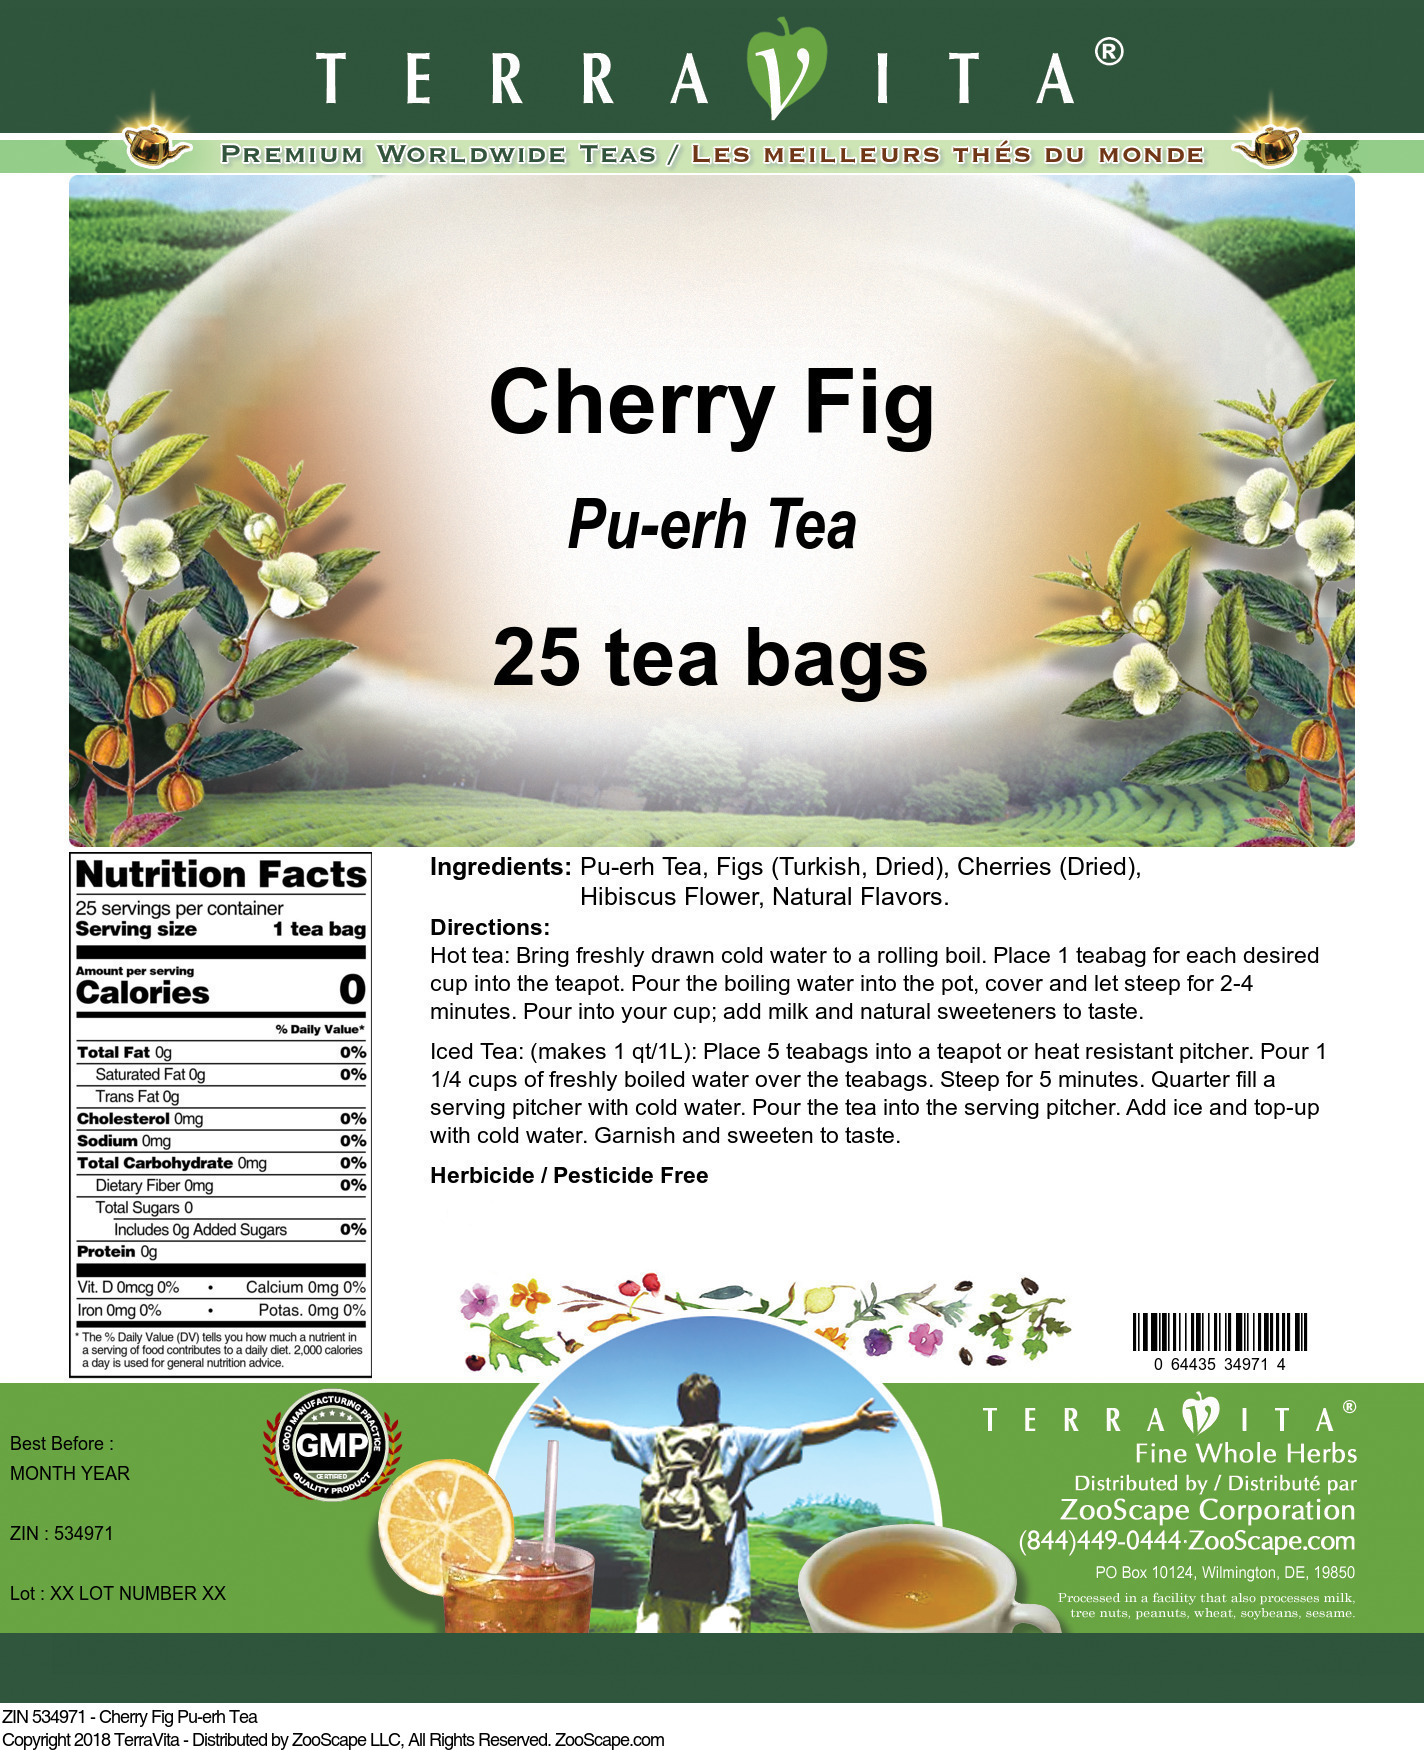 Cherry Fig Pu-erh Tea